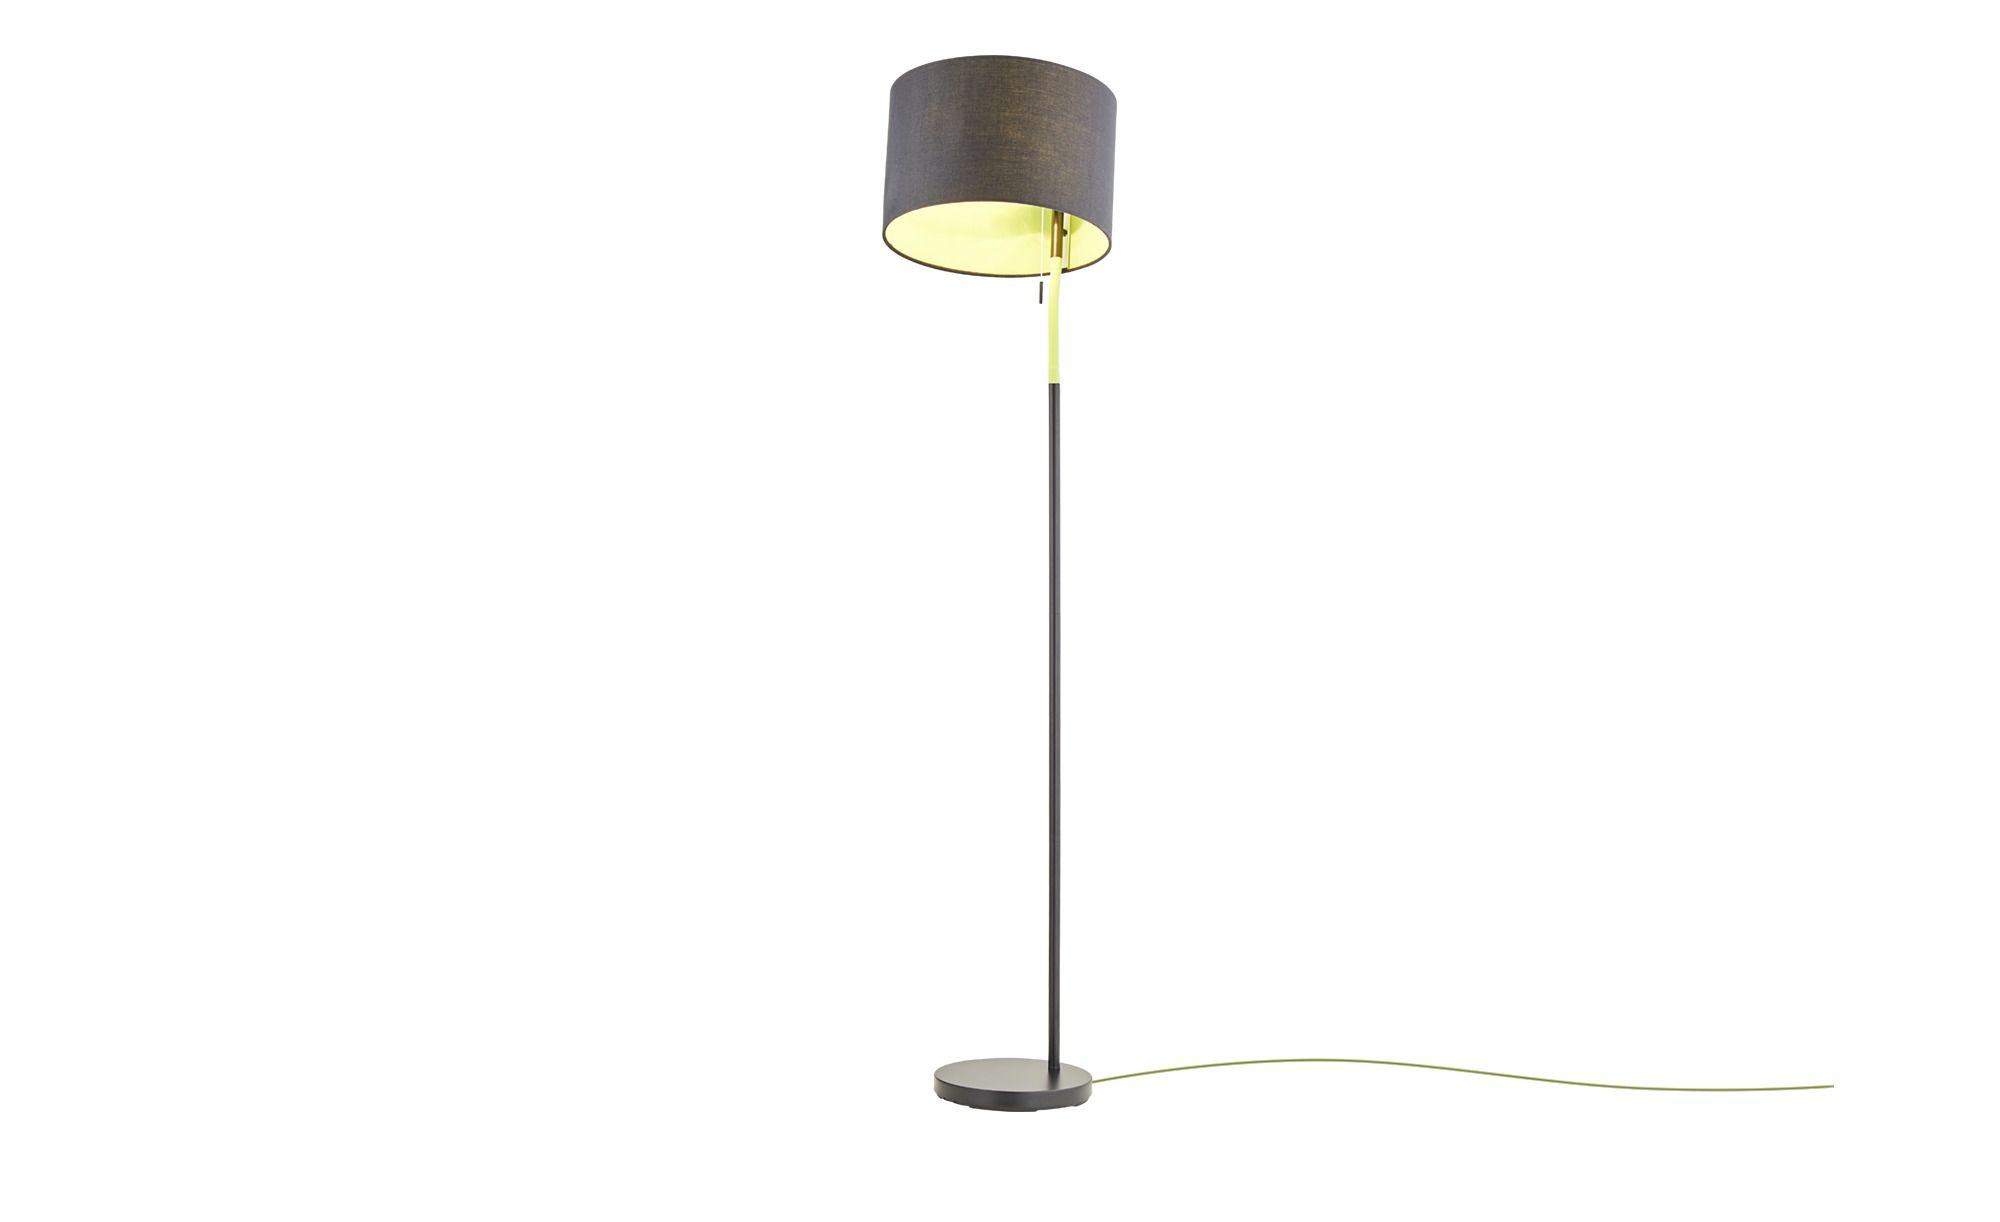 83a88f53586154d7a3189c4c0a8102ce Faszinierend Stehlampe Studio Schwarz Gold Dekorationen